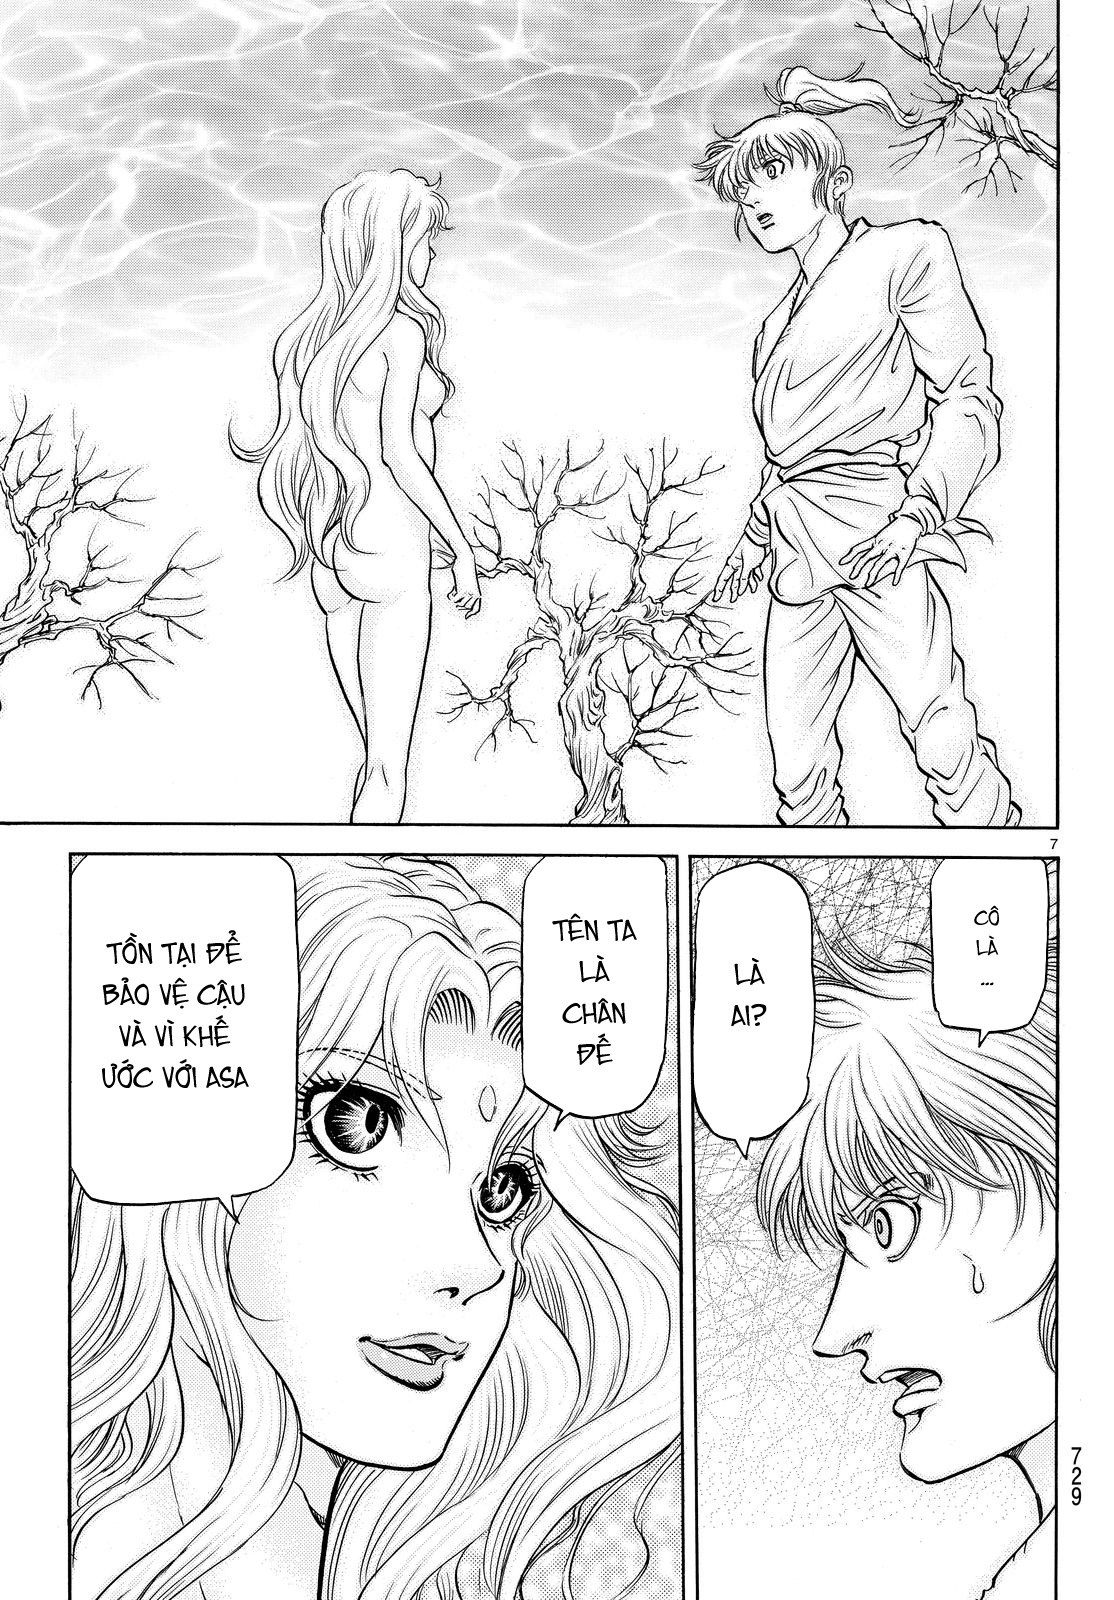 Ryuuroden chu be rong chap 265 trang 6 manga24h